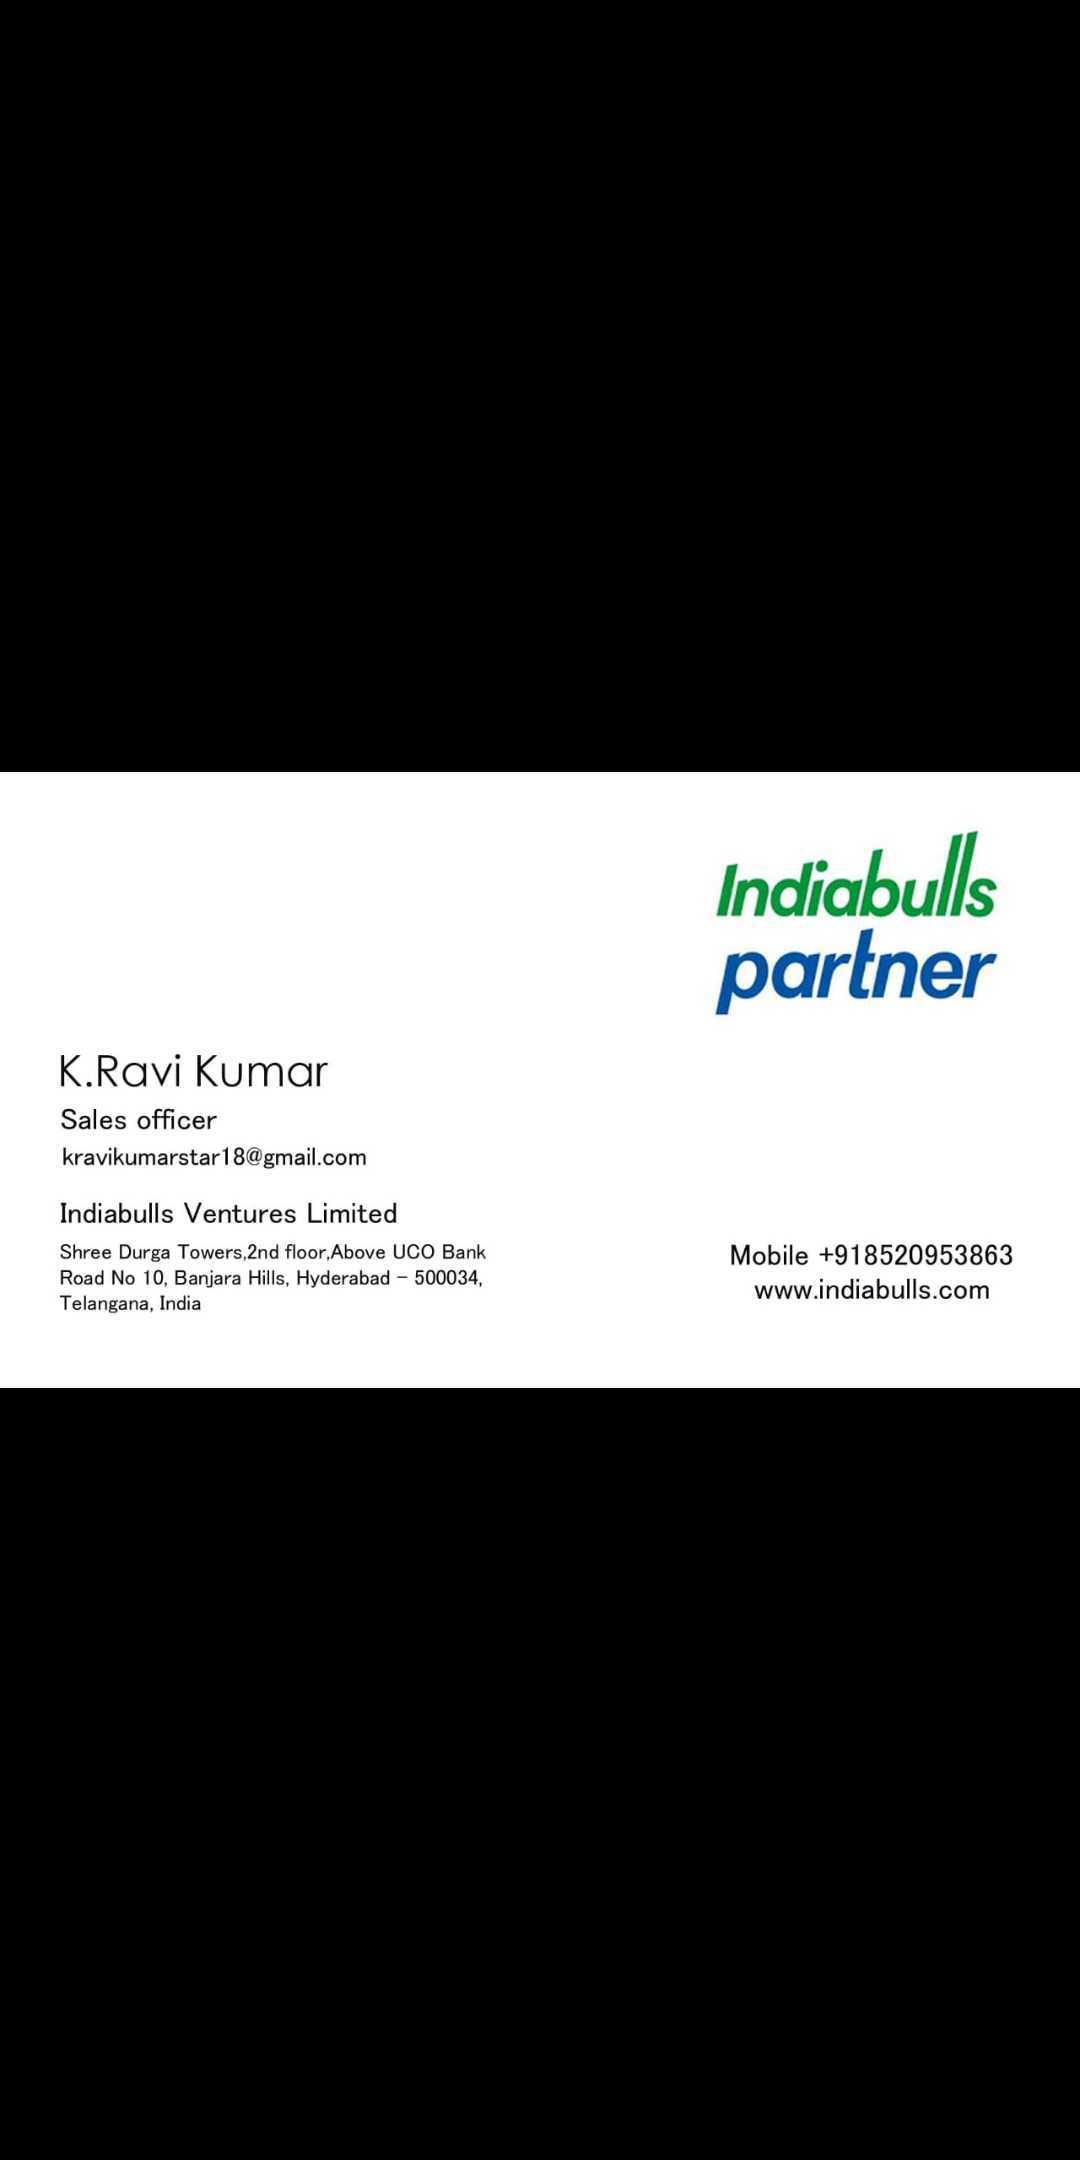 Indiabulls Dhani Partner In Anandbagh Hyderabad 500047 Sulekha Hyderabad